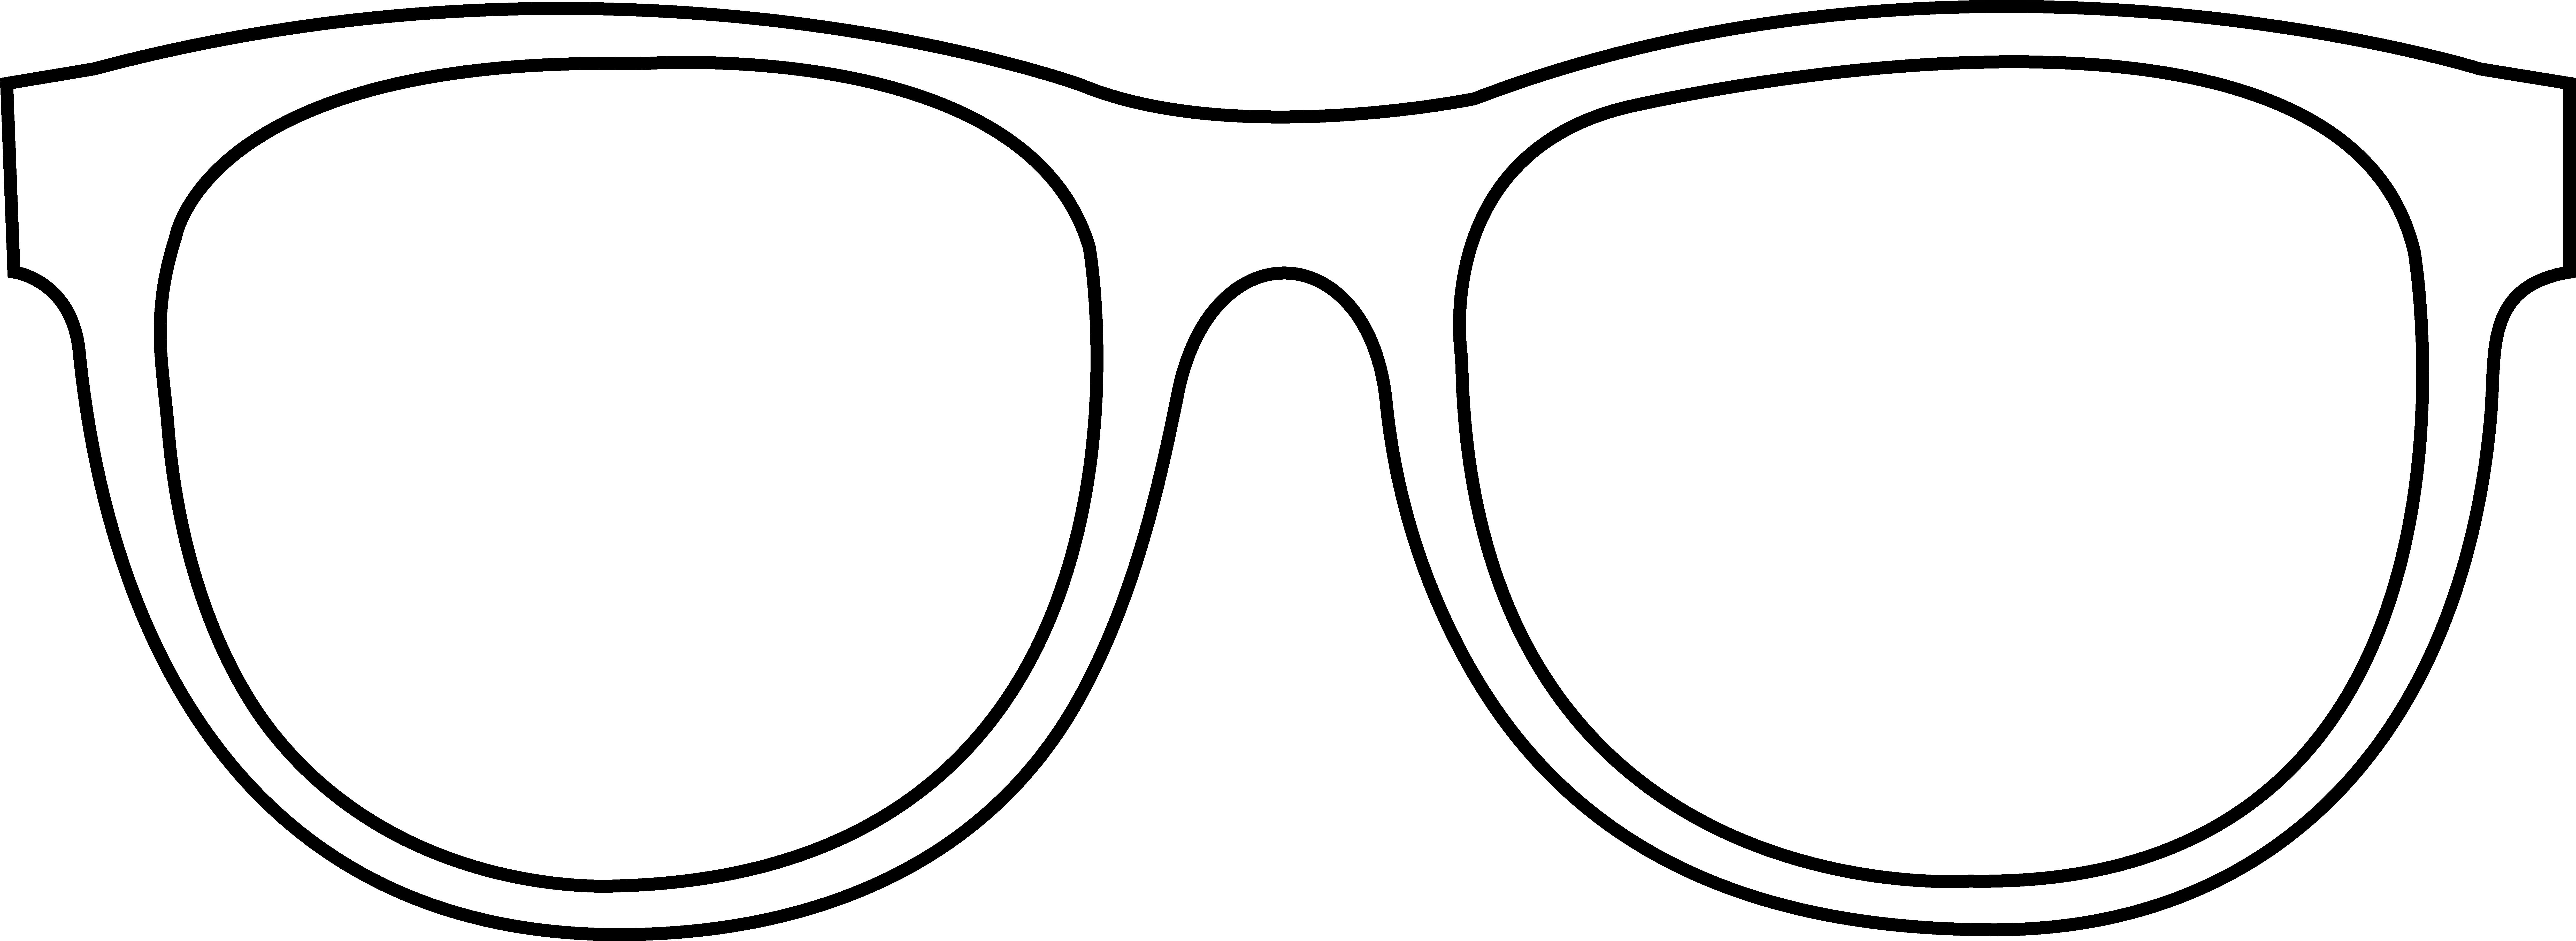 Vector Frames  6167 Free Downloads